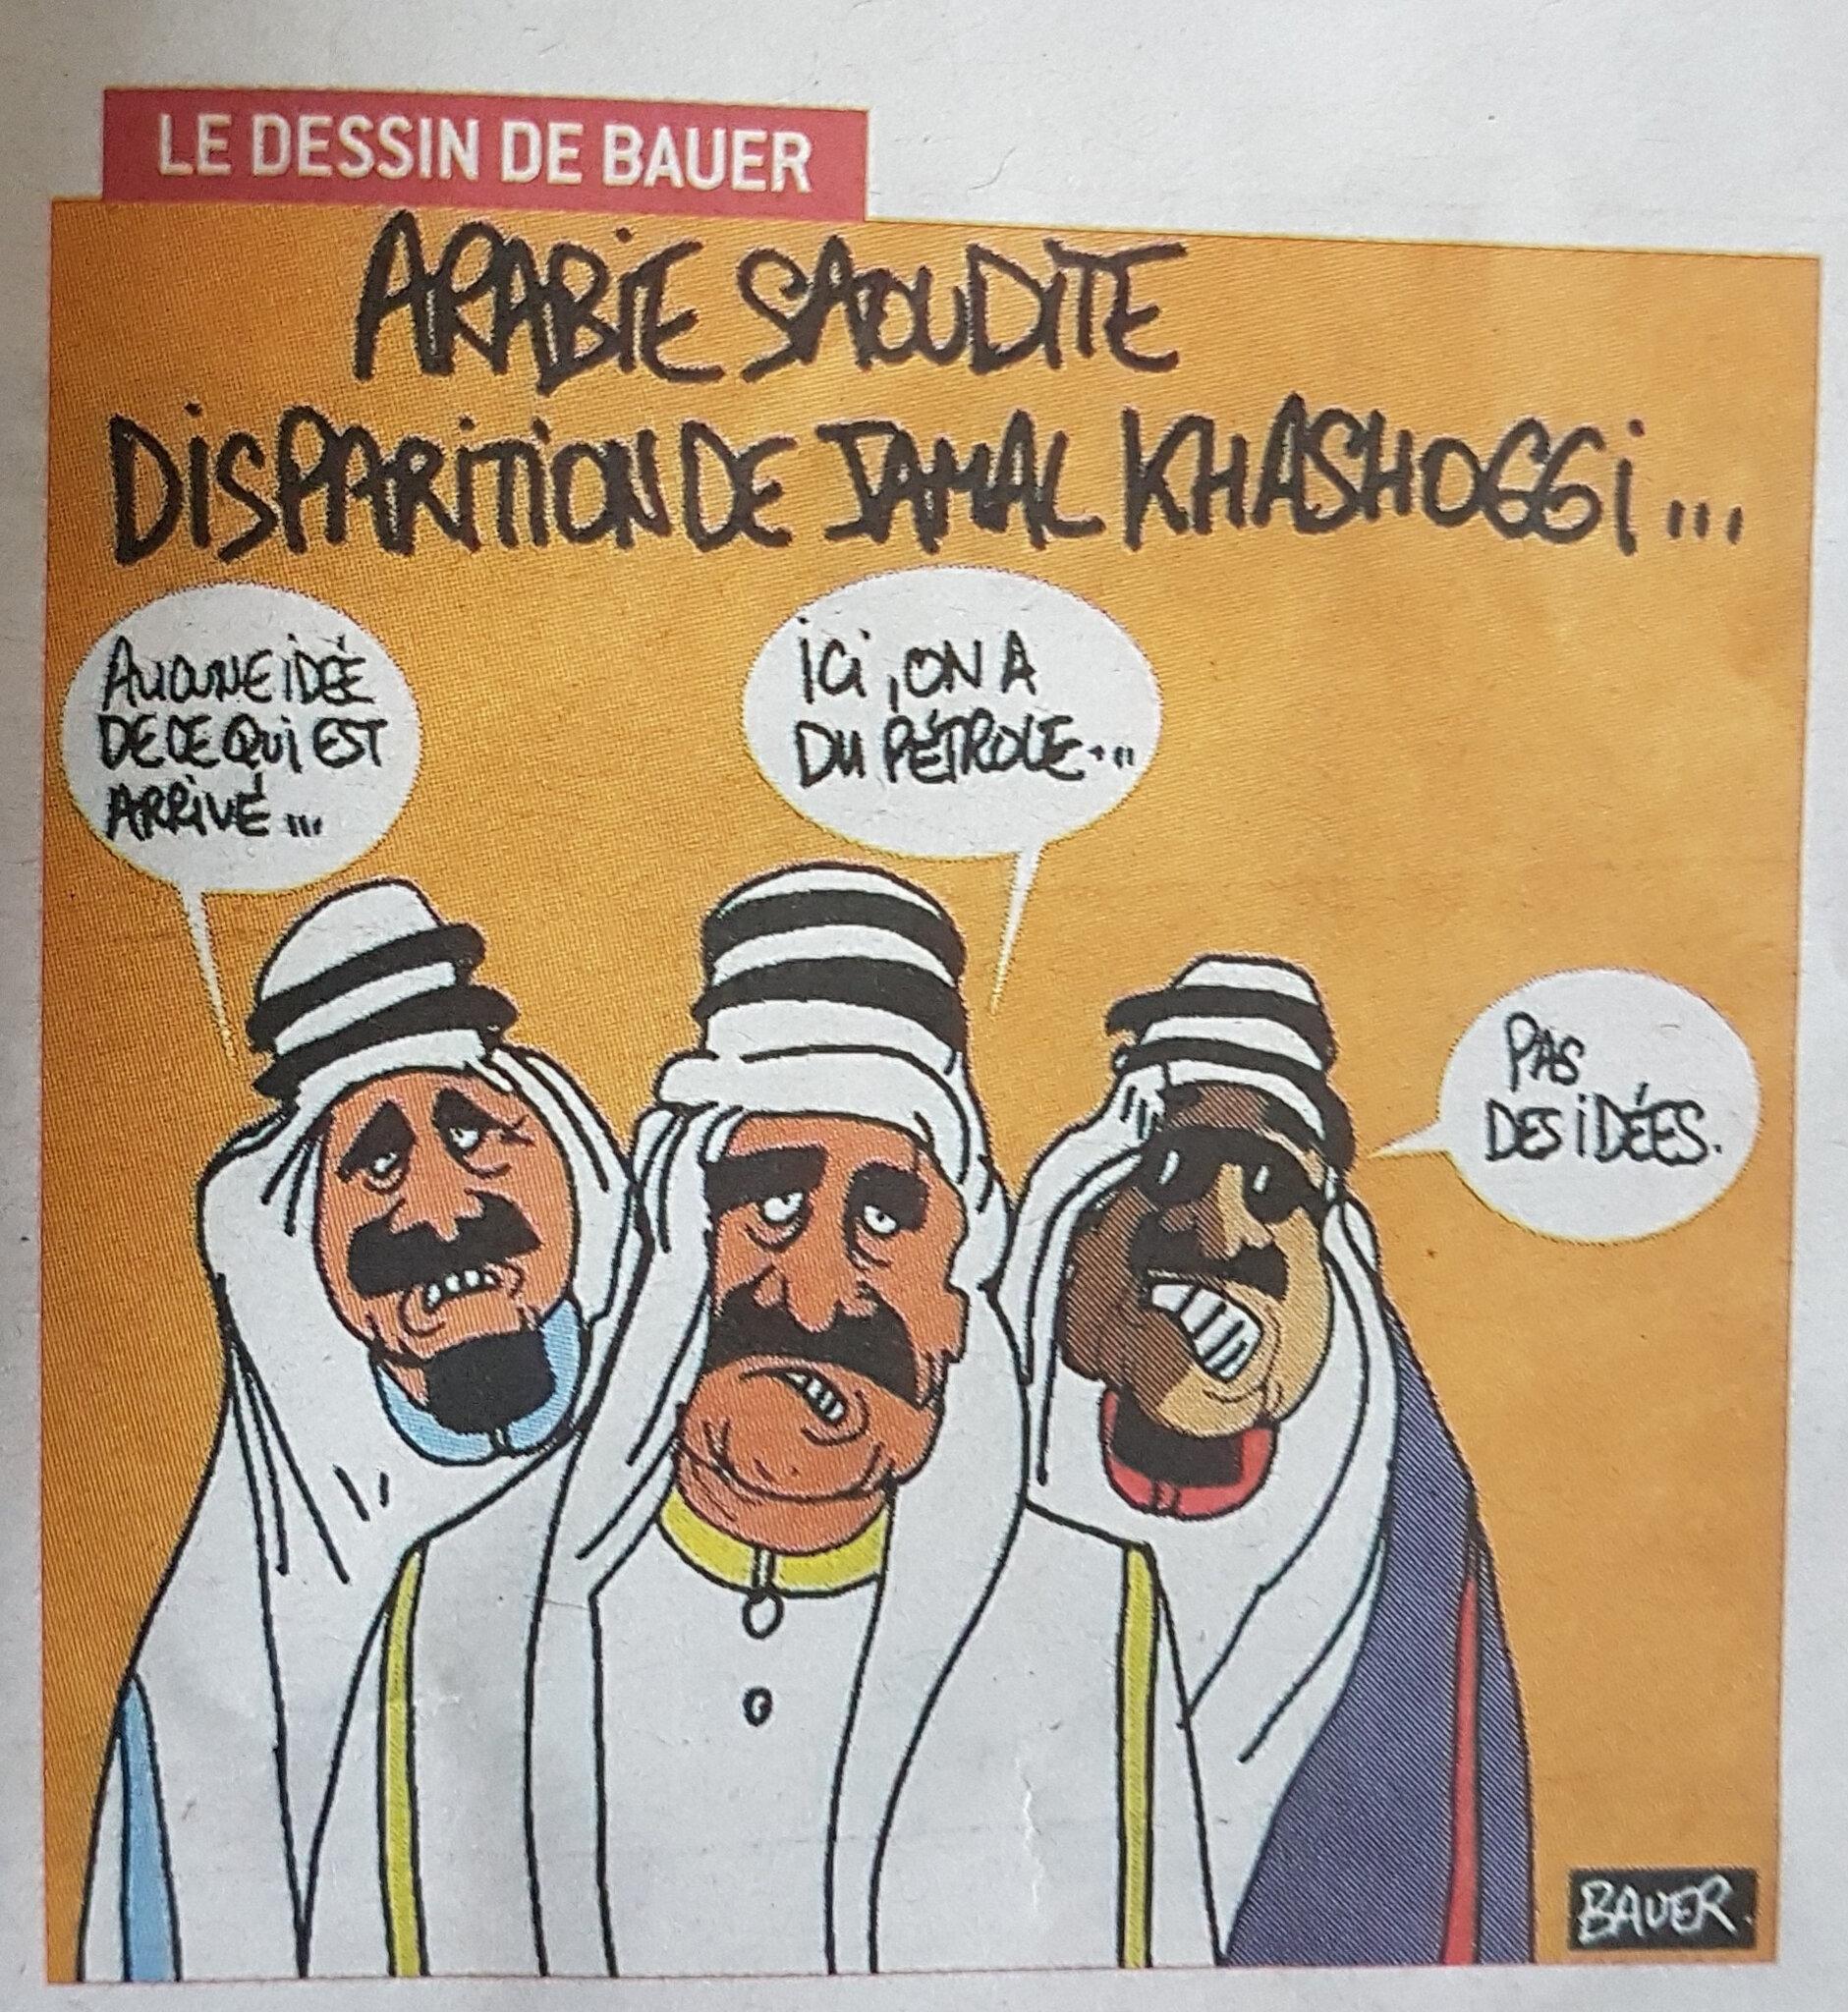 arabie saoudite humour journaliste mbs